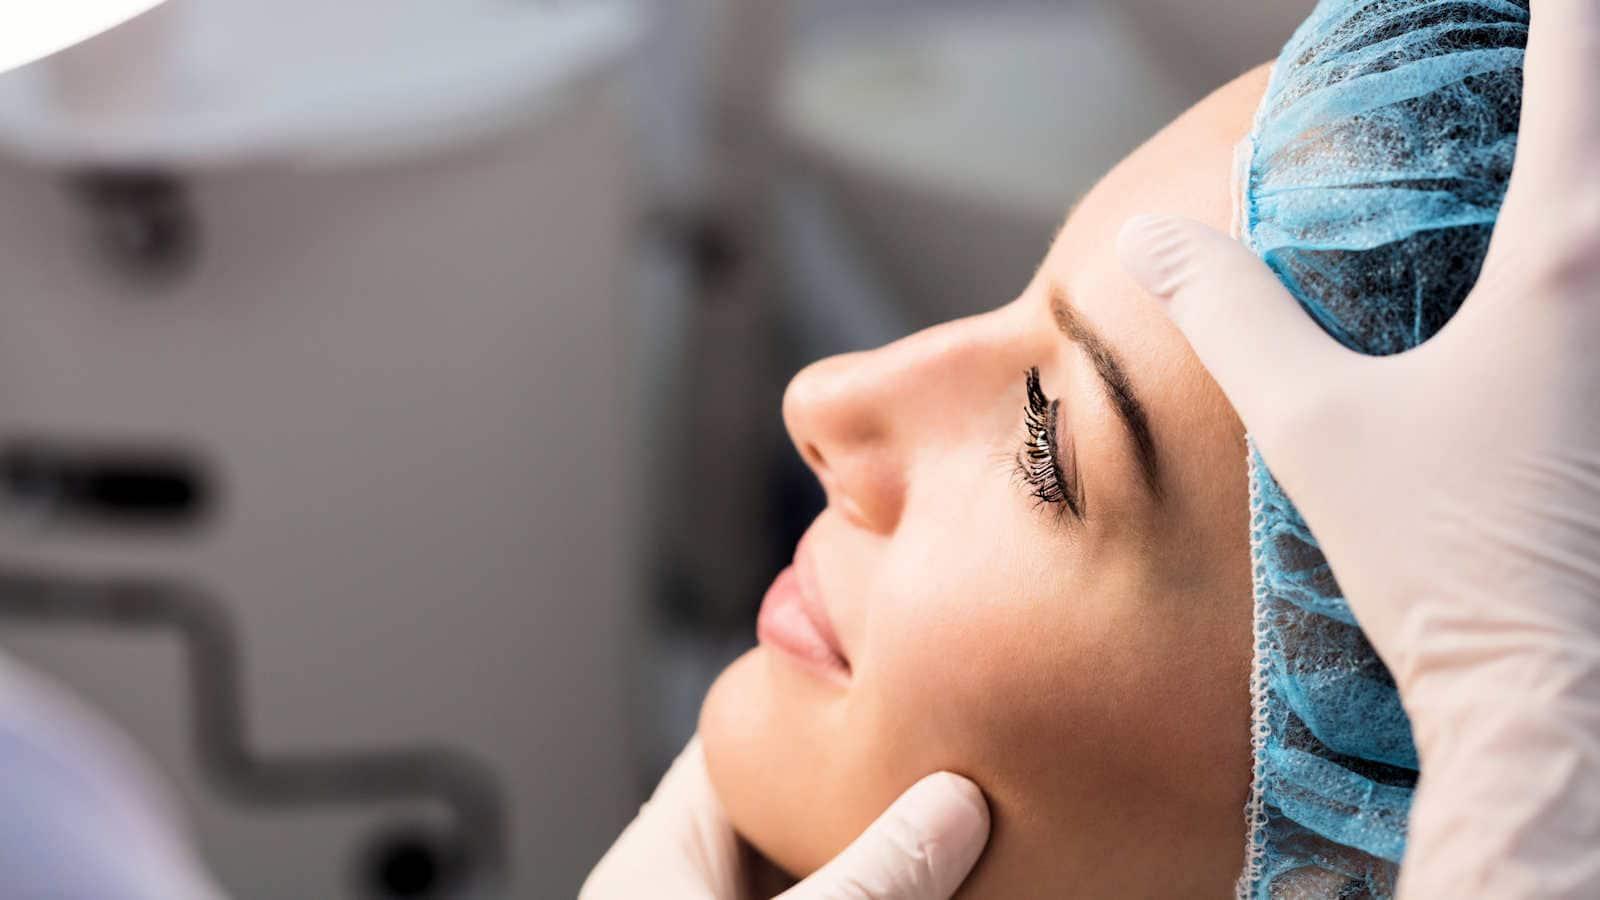 The Dermatology Center of Plainfield